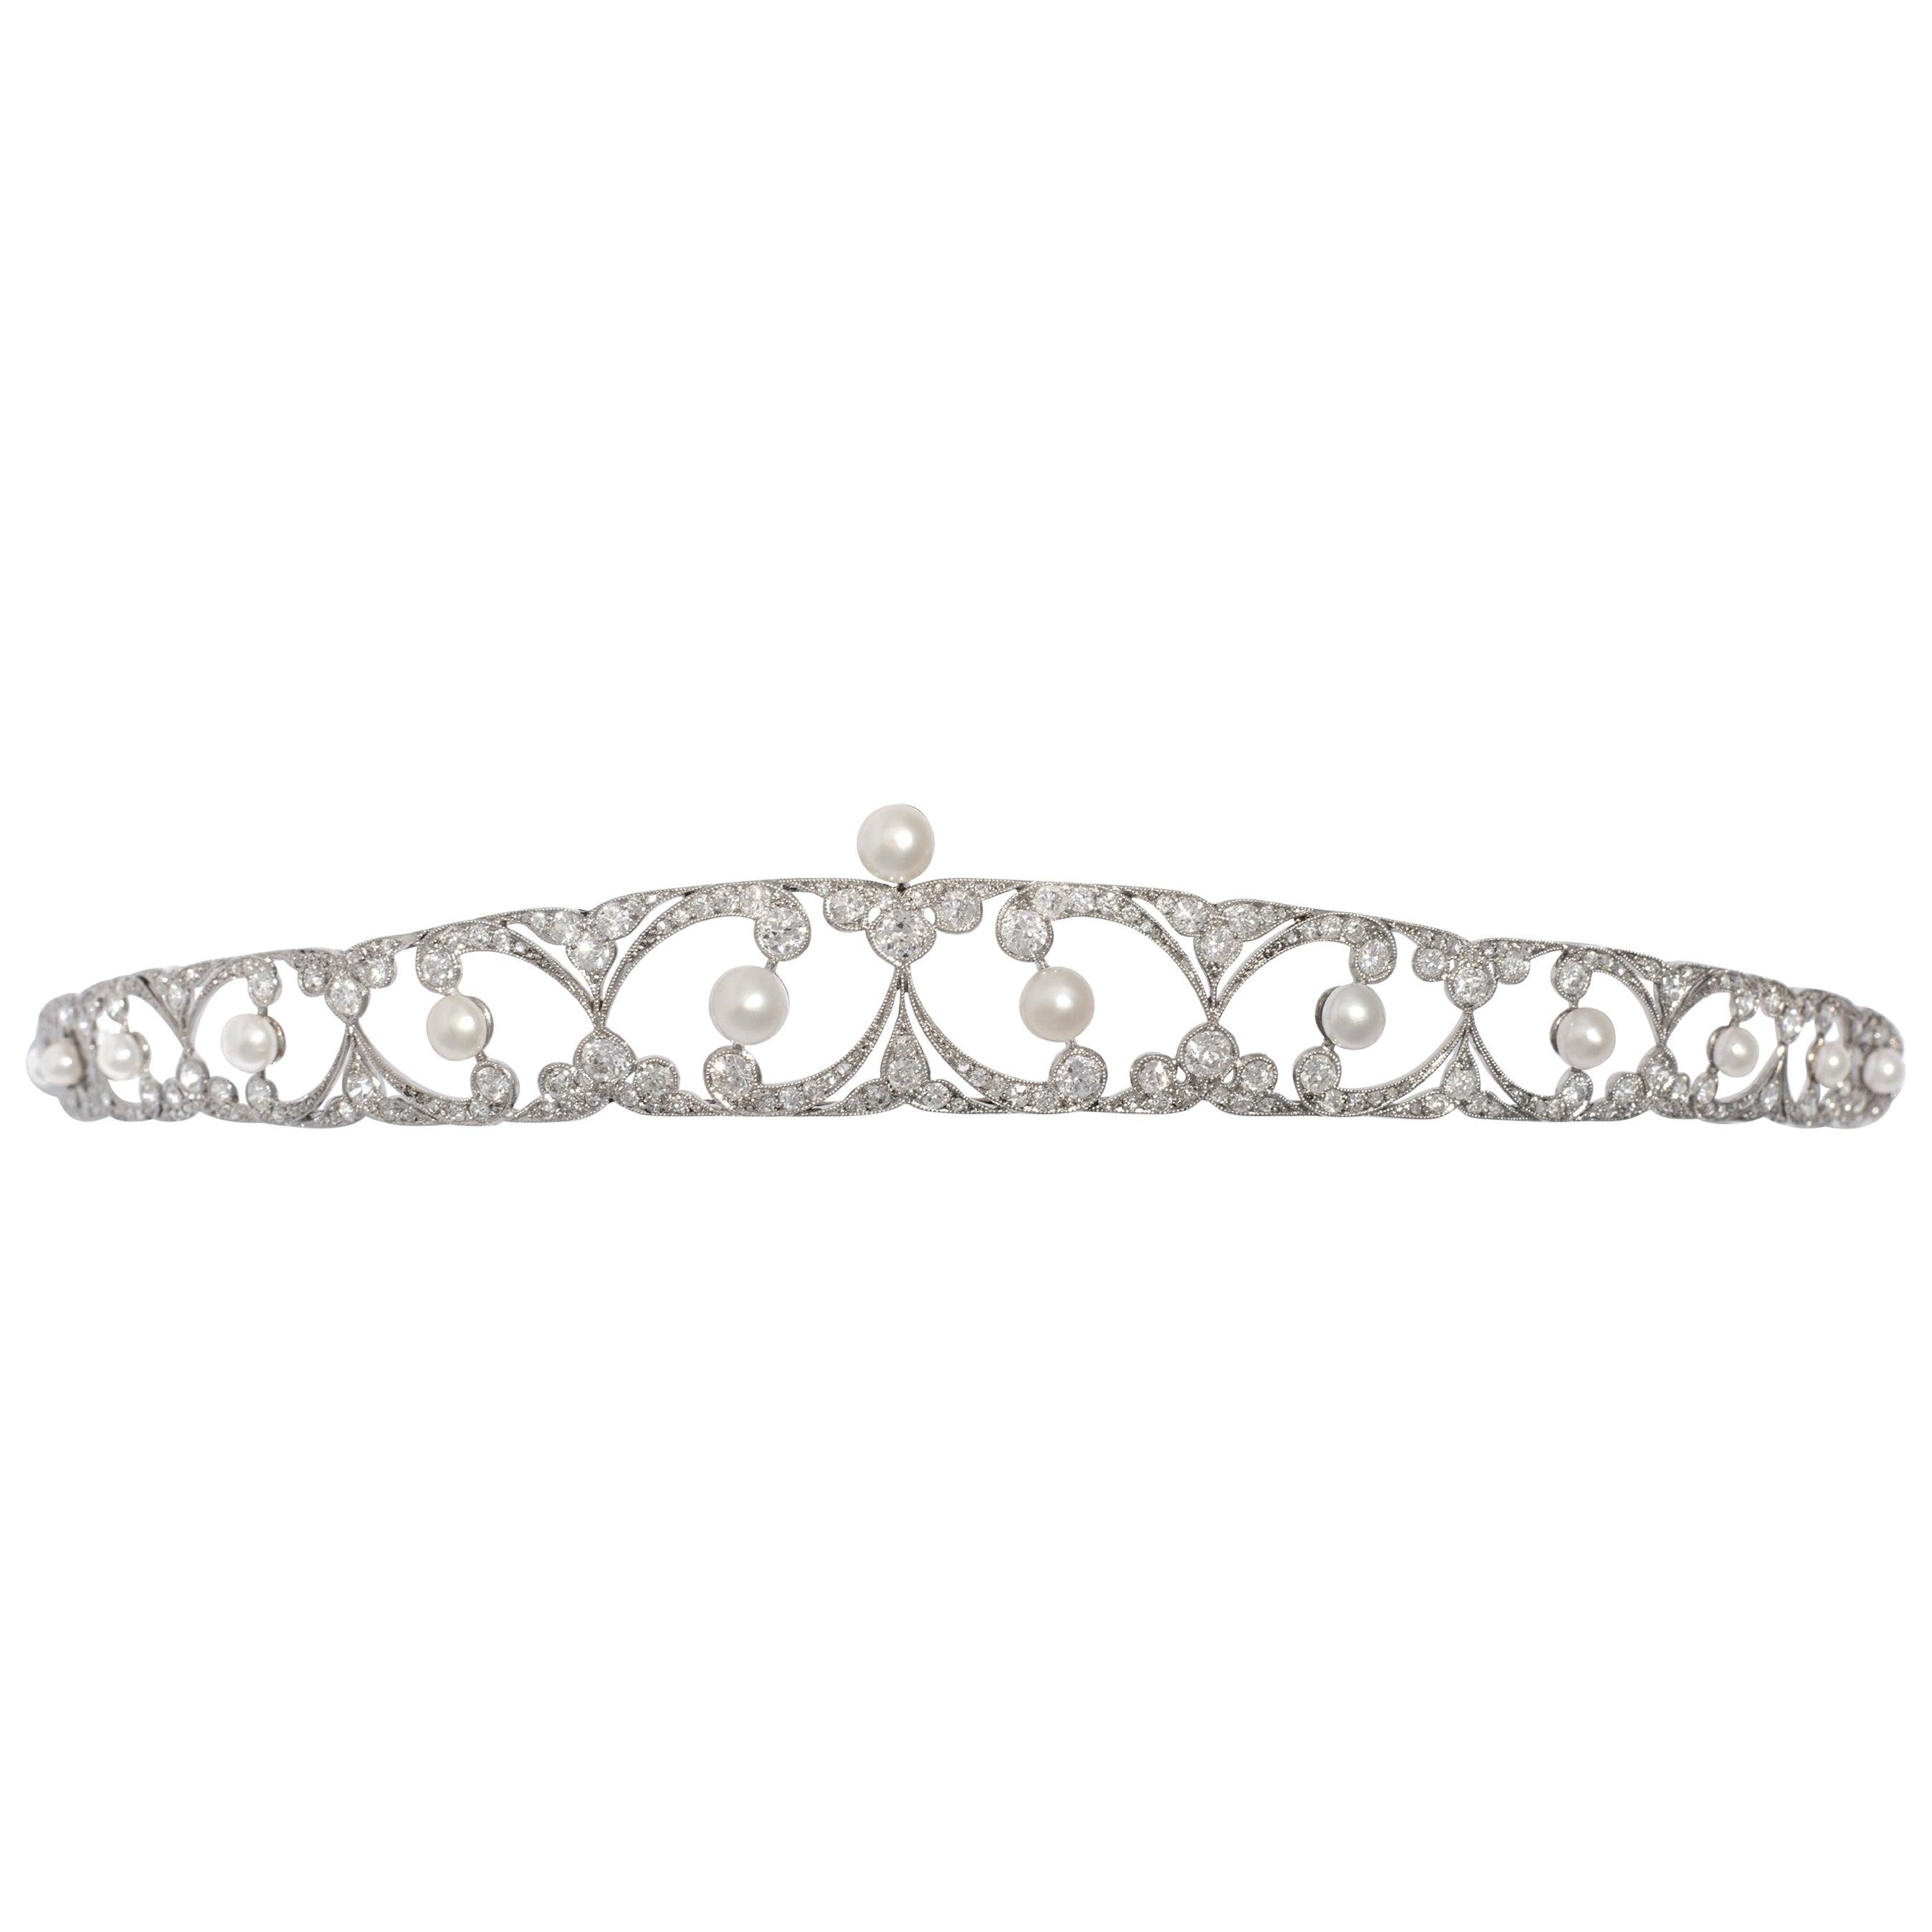 Belle Epoque Tiara Diamond and Pearl